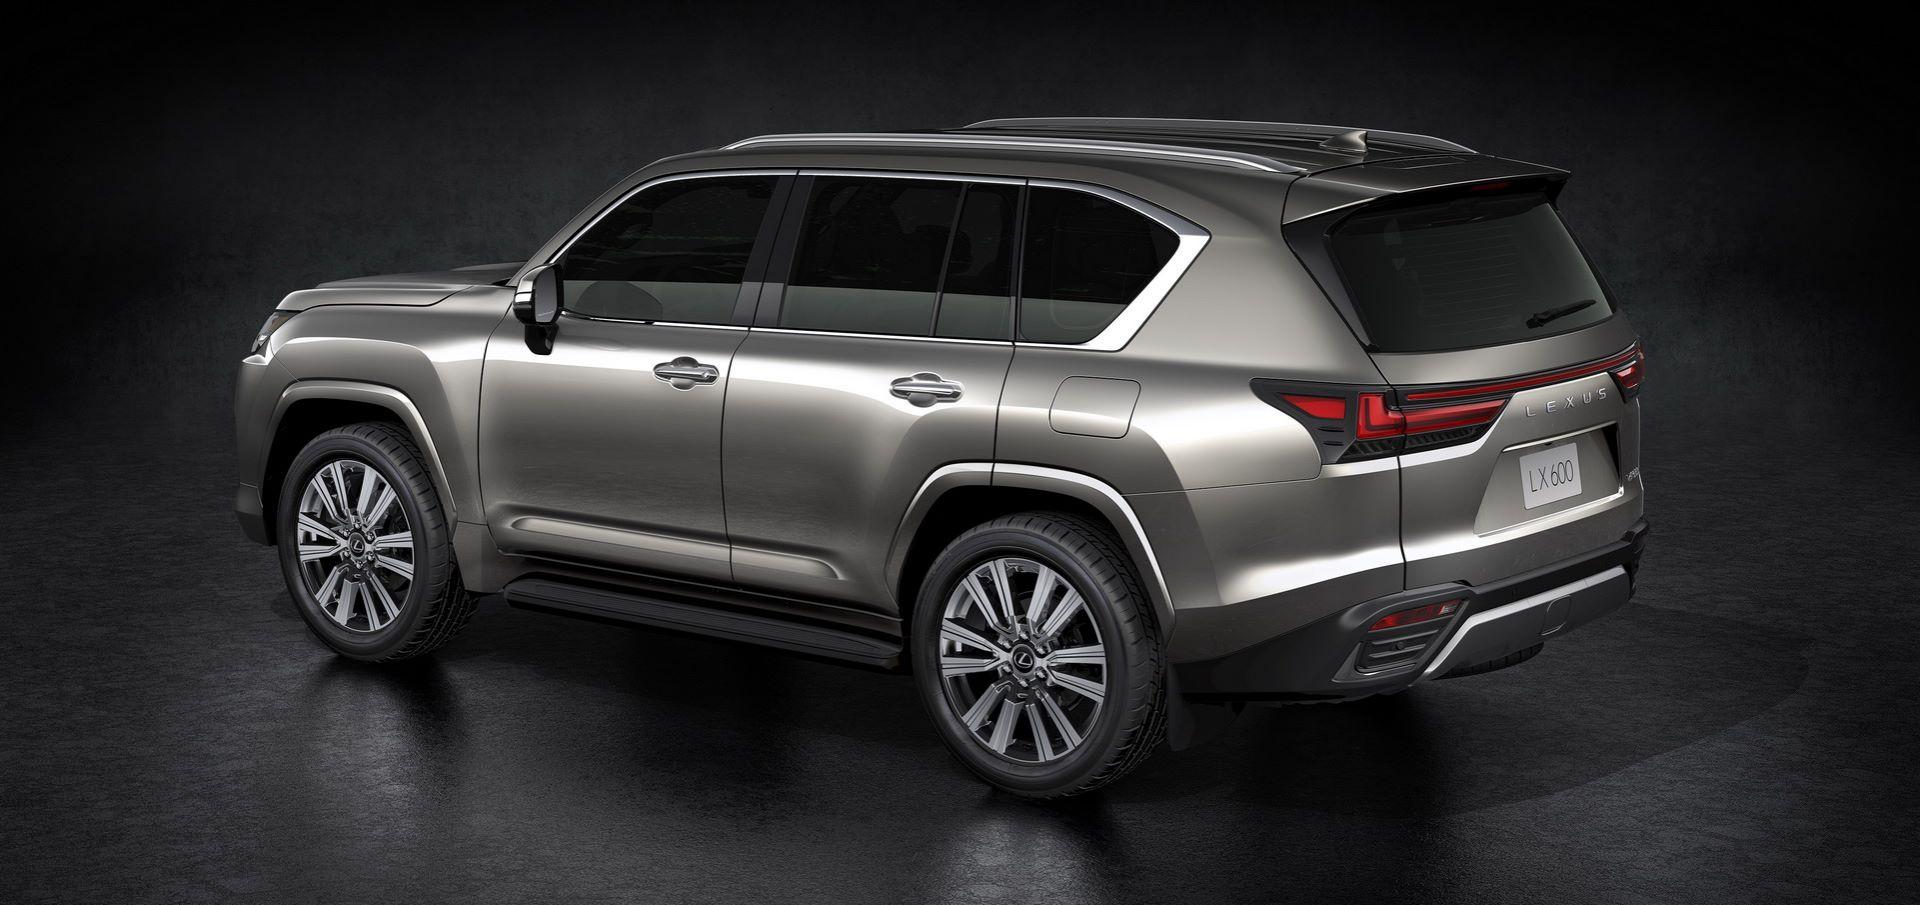 Lexus-LX-2021-35